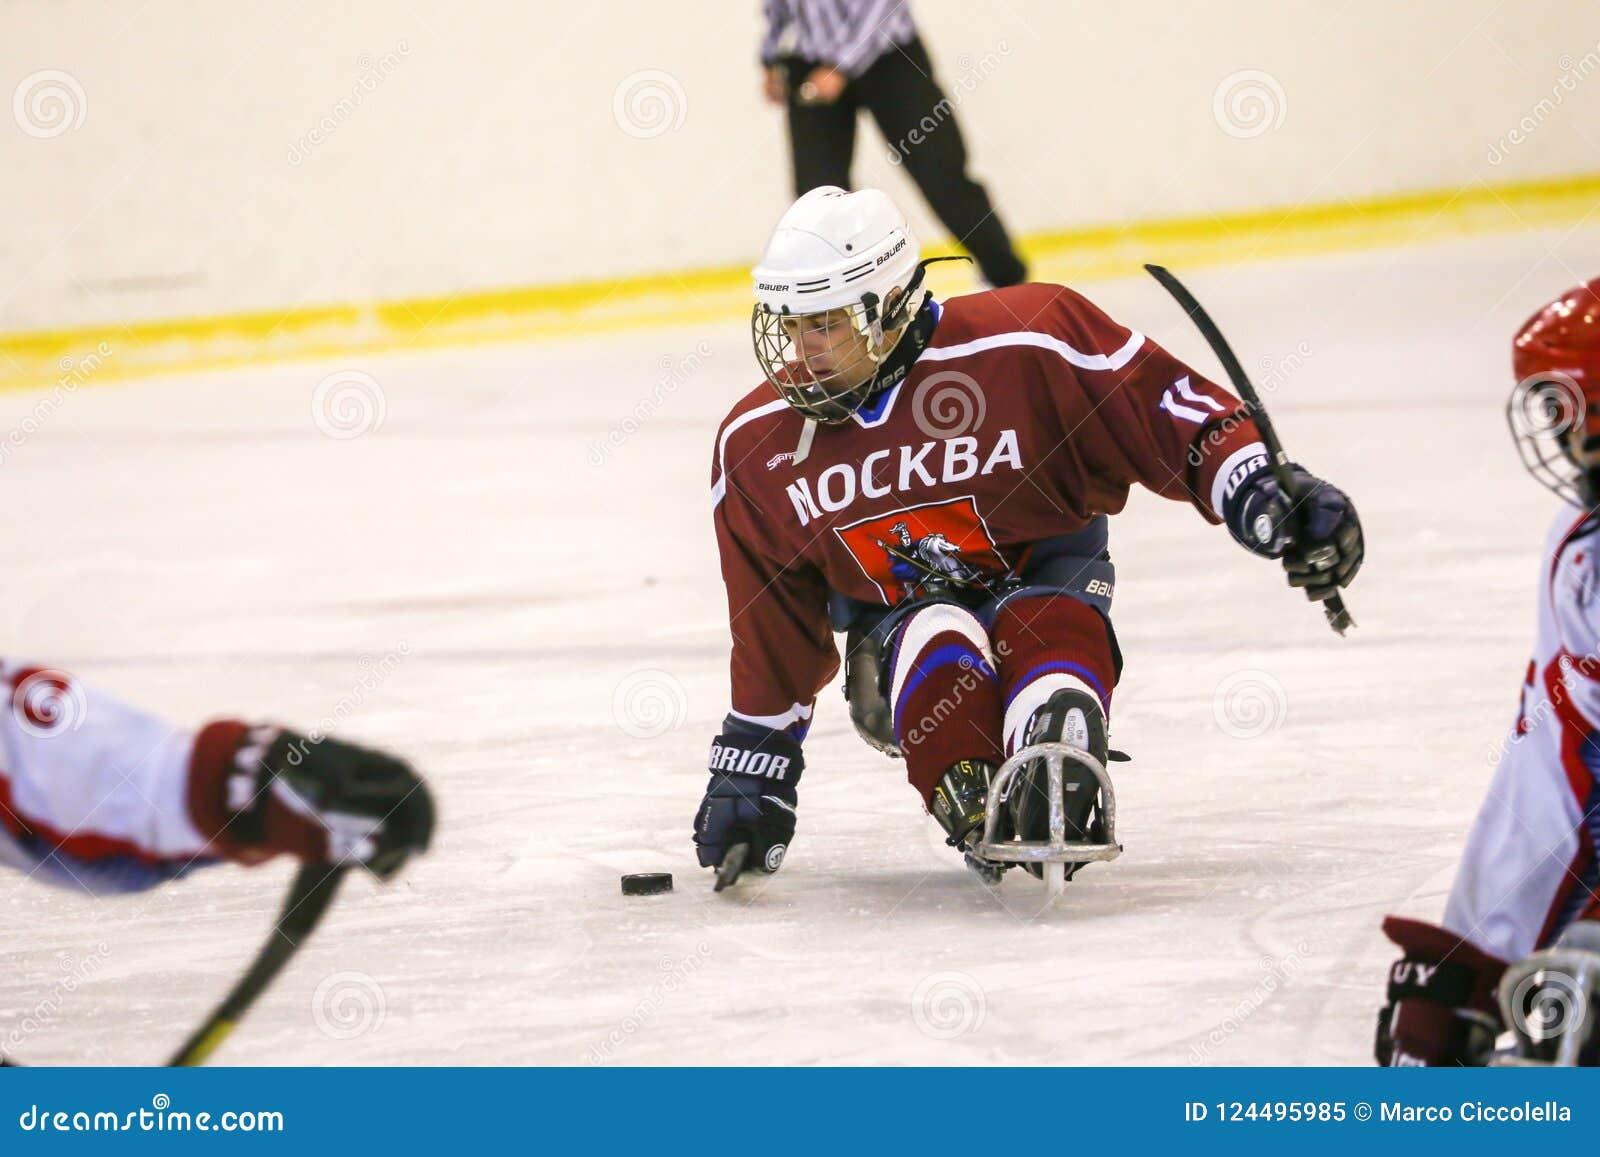 Russian Bandy Championship 2017 - 2018 18